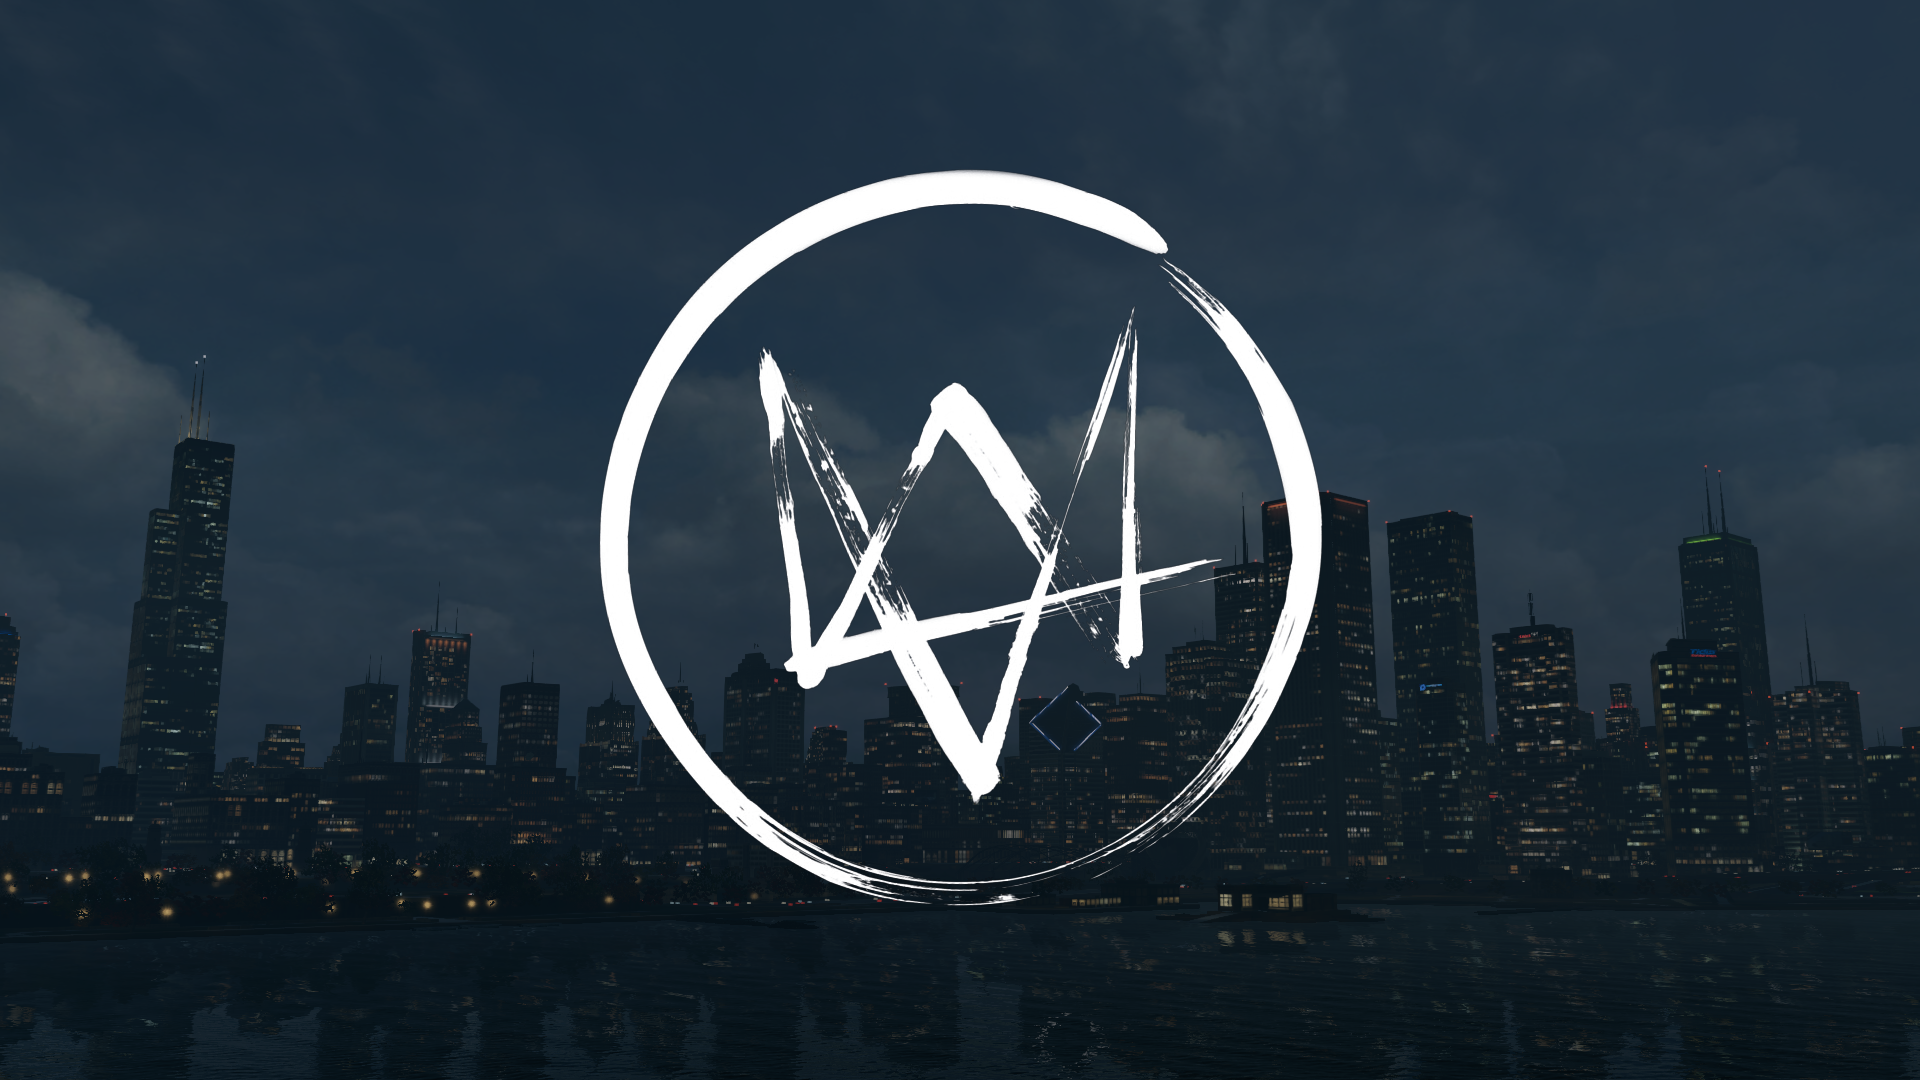 Watcog Logo Wallpaper Hd Resolution Gamers Wallpaper 1080p